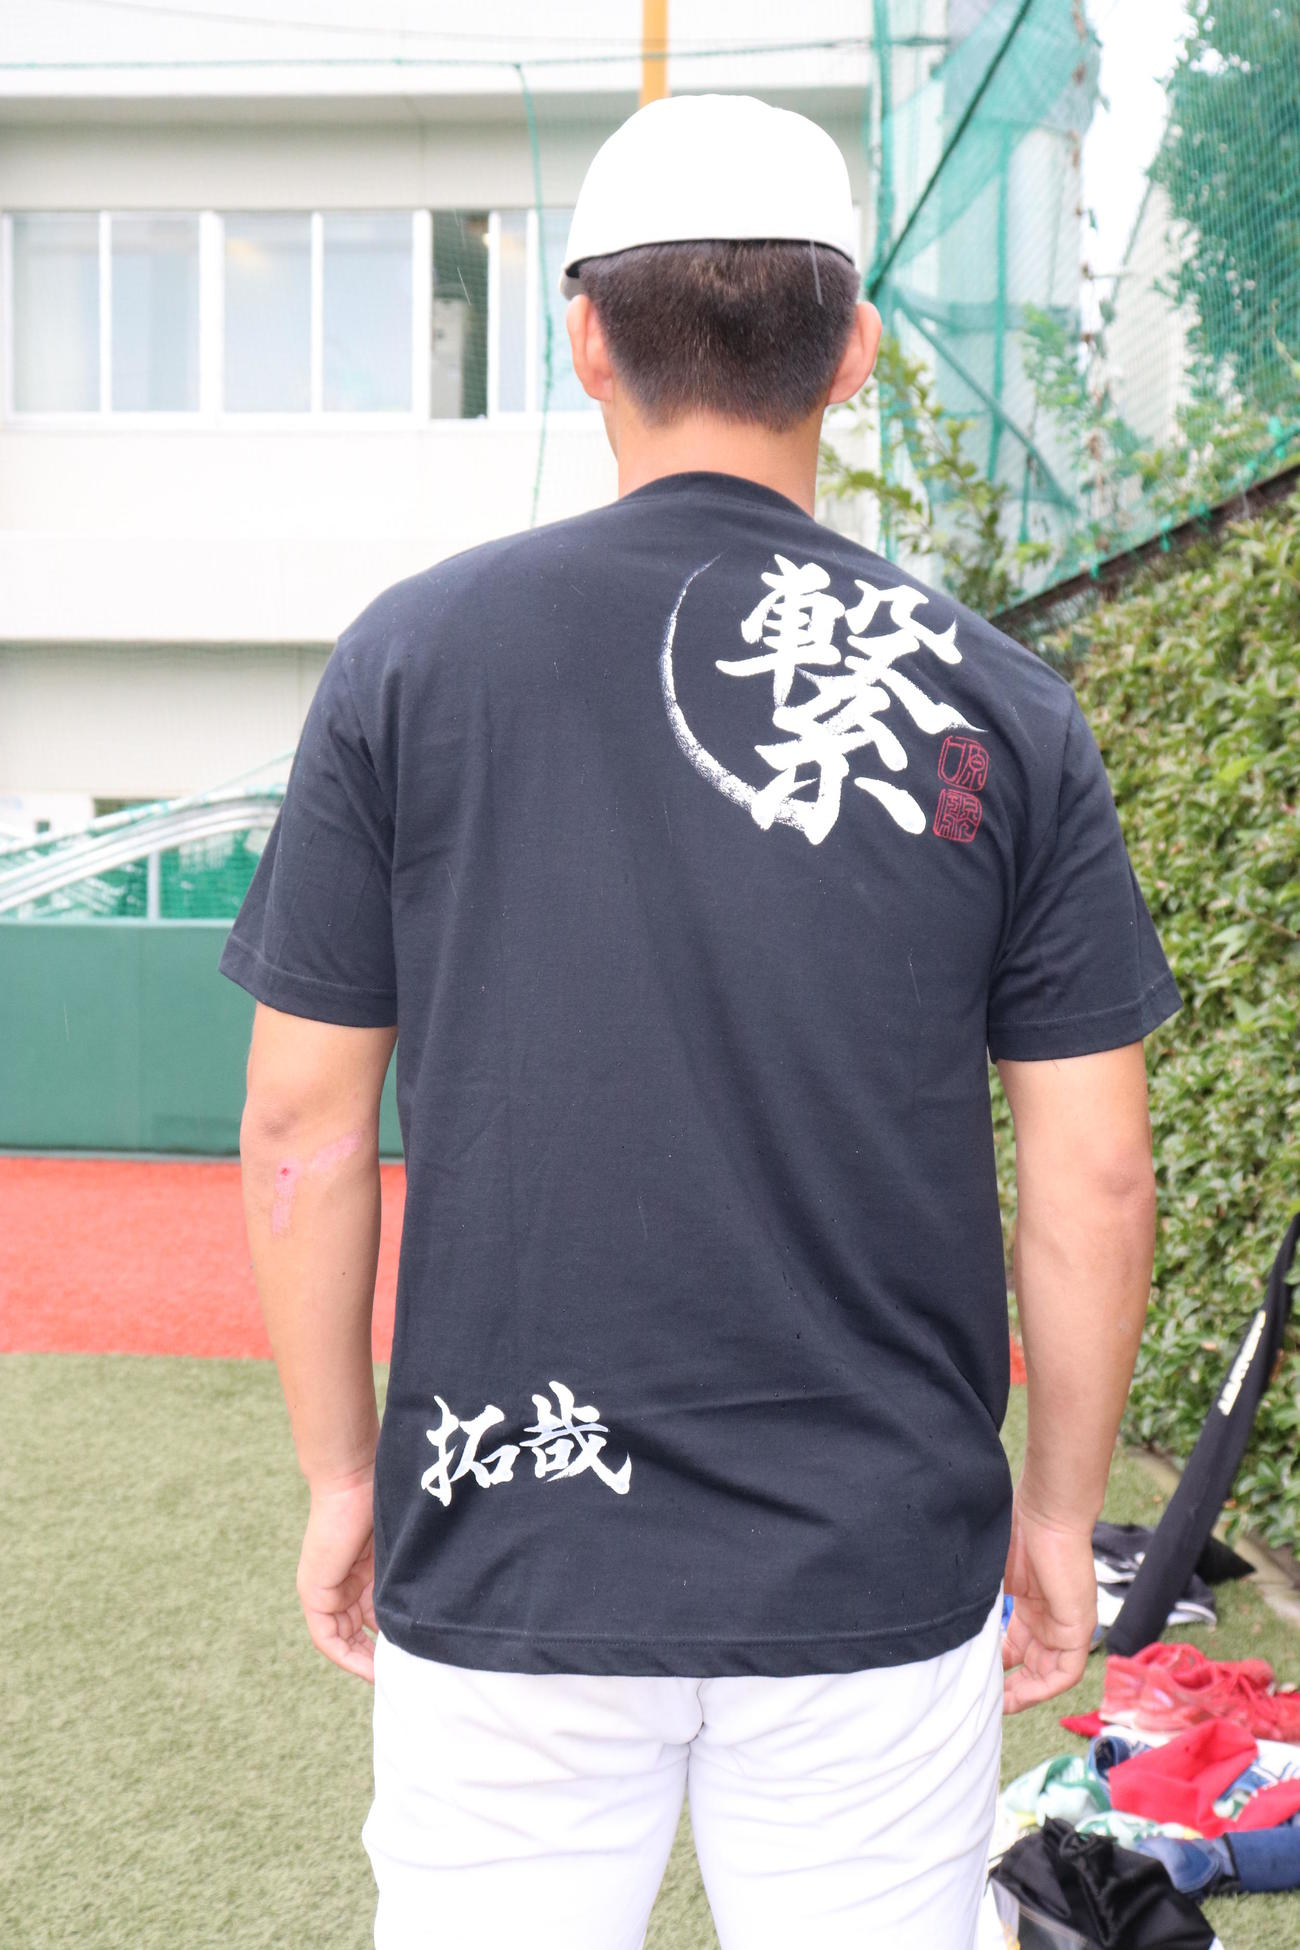 OBである阪神原口から贈られたTシャツを着る帝京・加田。裏には「繋」の文字と、各選手の名前が記されている(撮影・古川真弥)